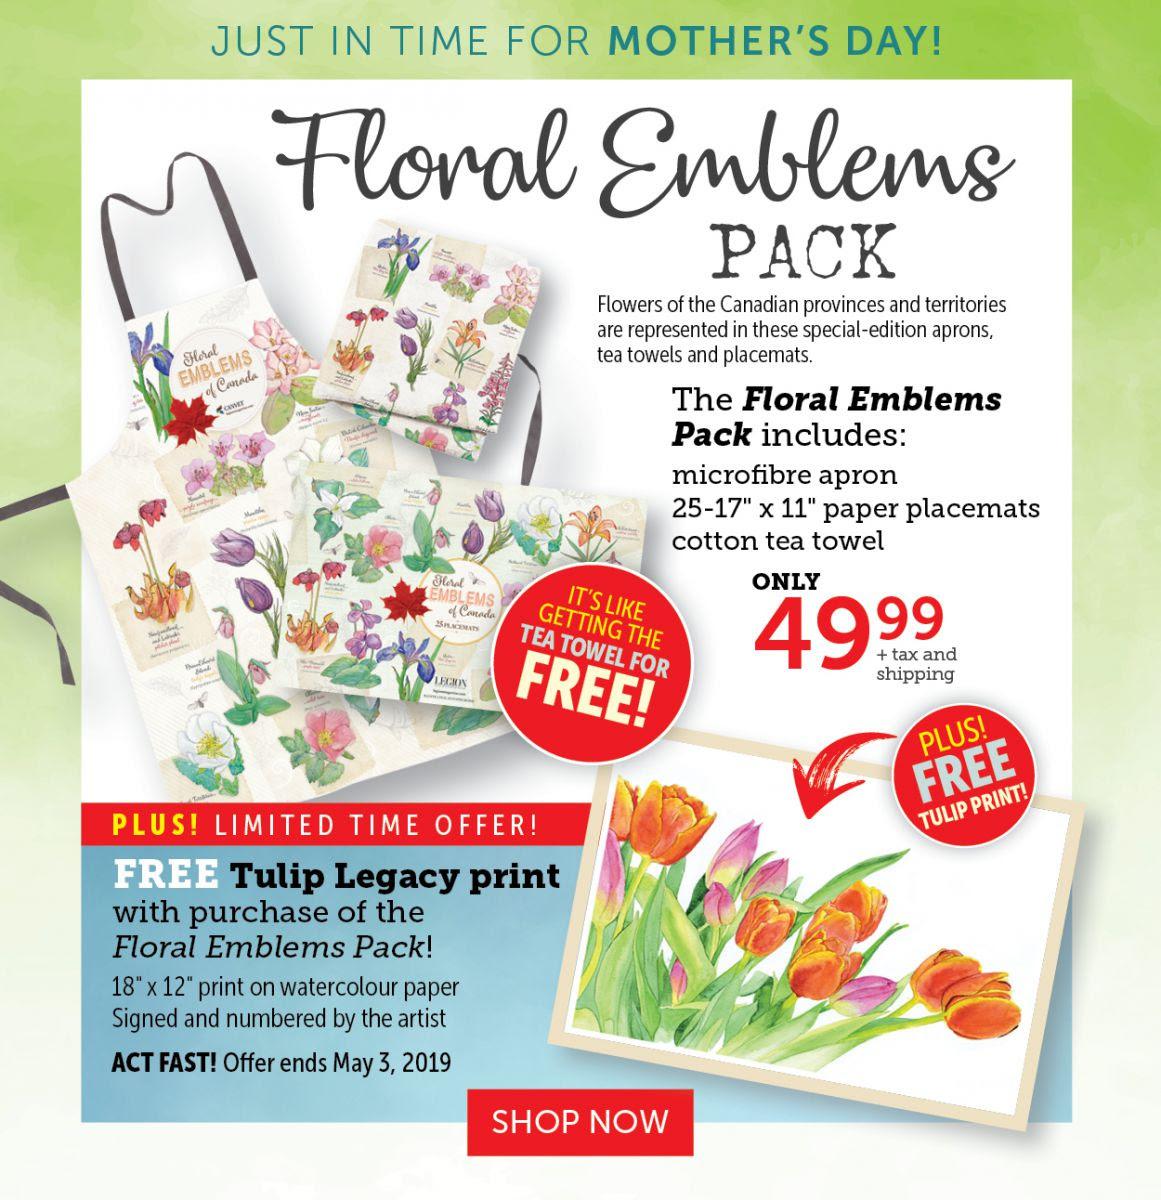 Floral Emblems Pack + FREE TULIP LEGACY